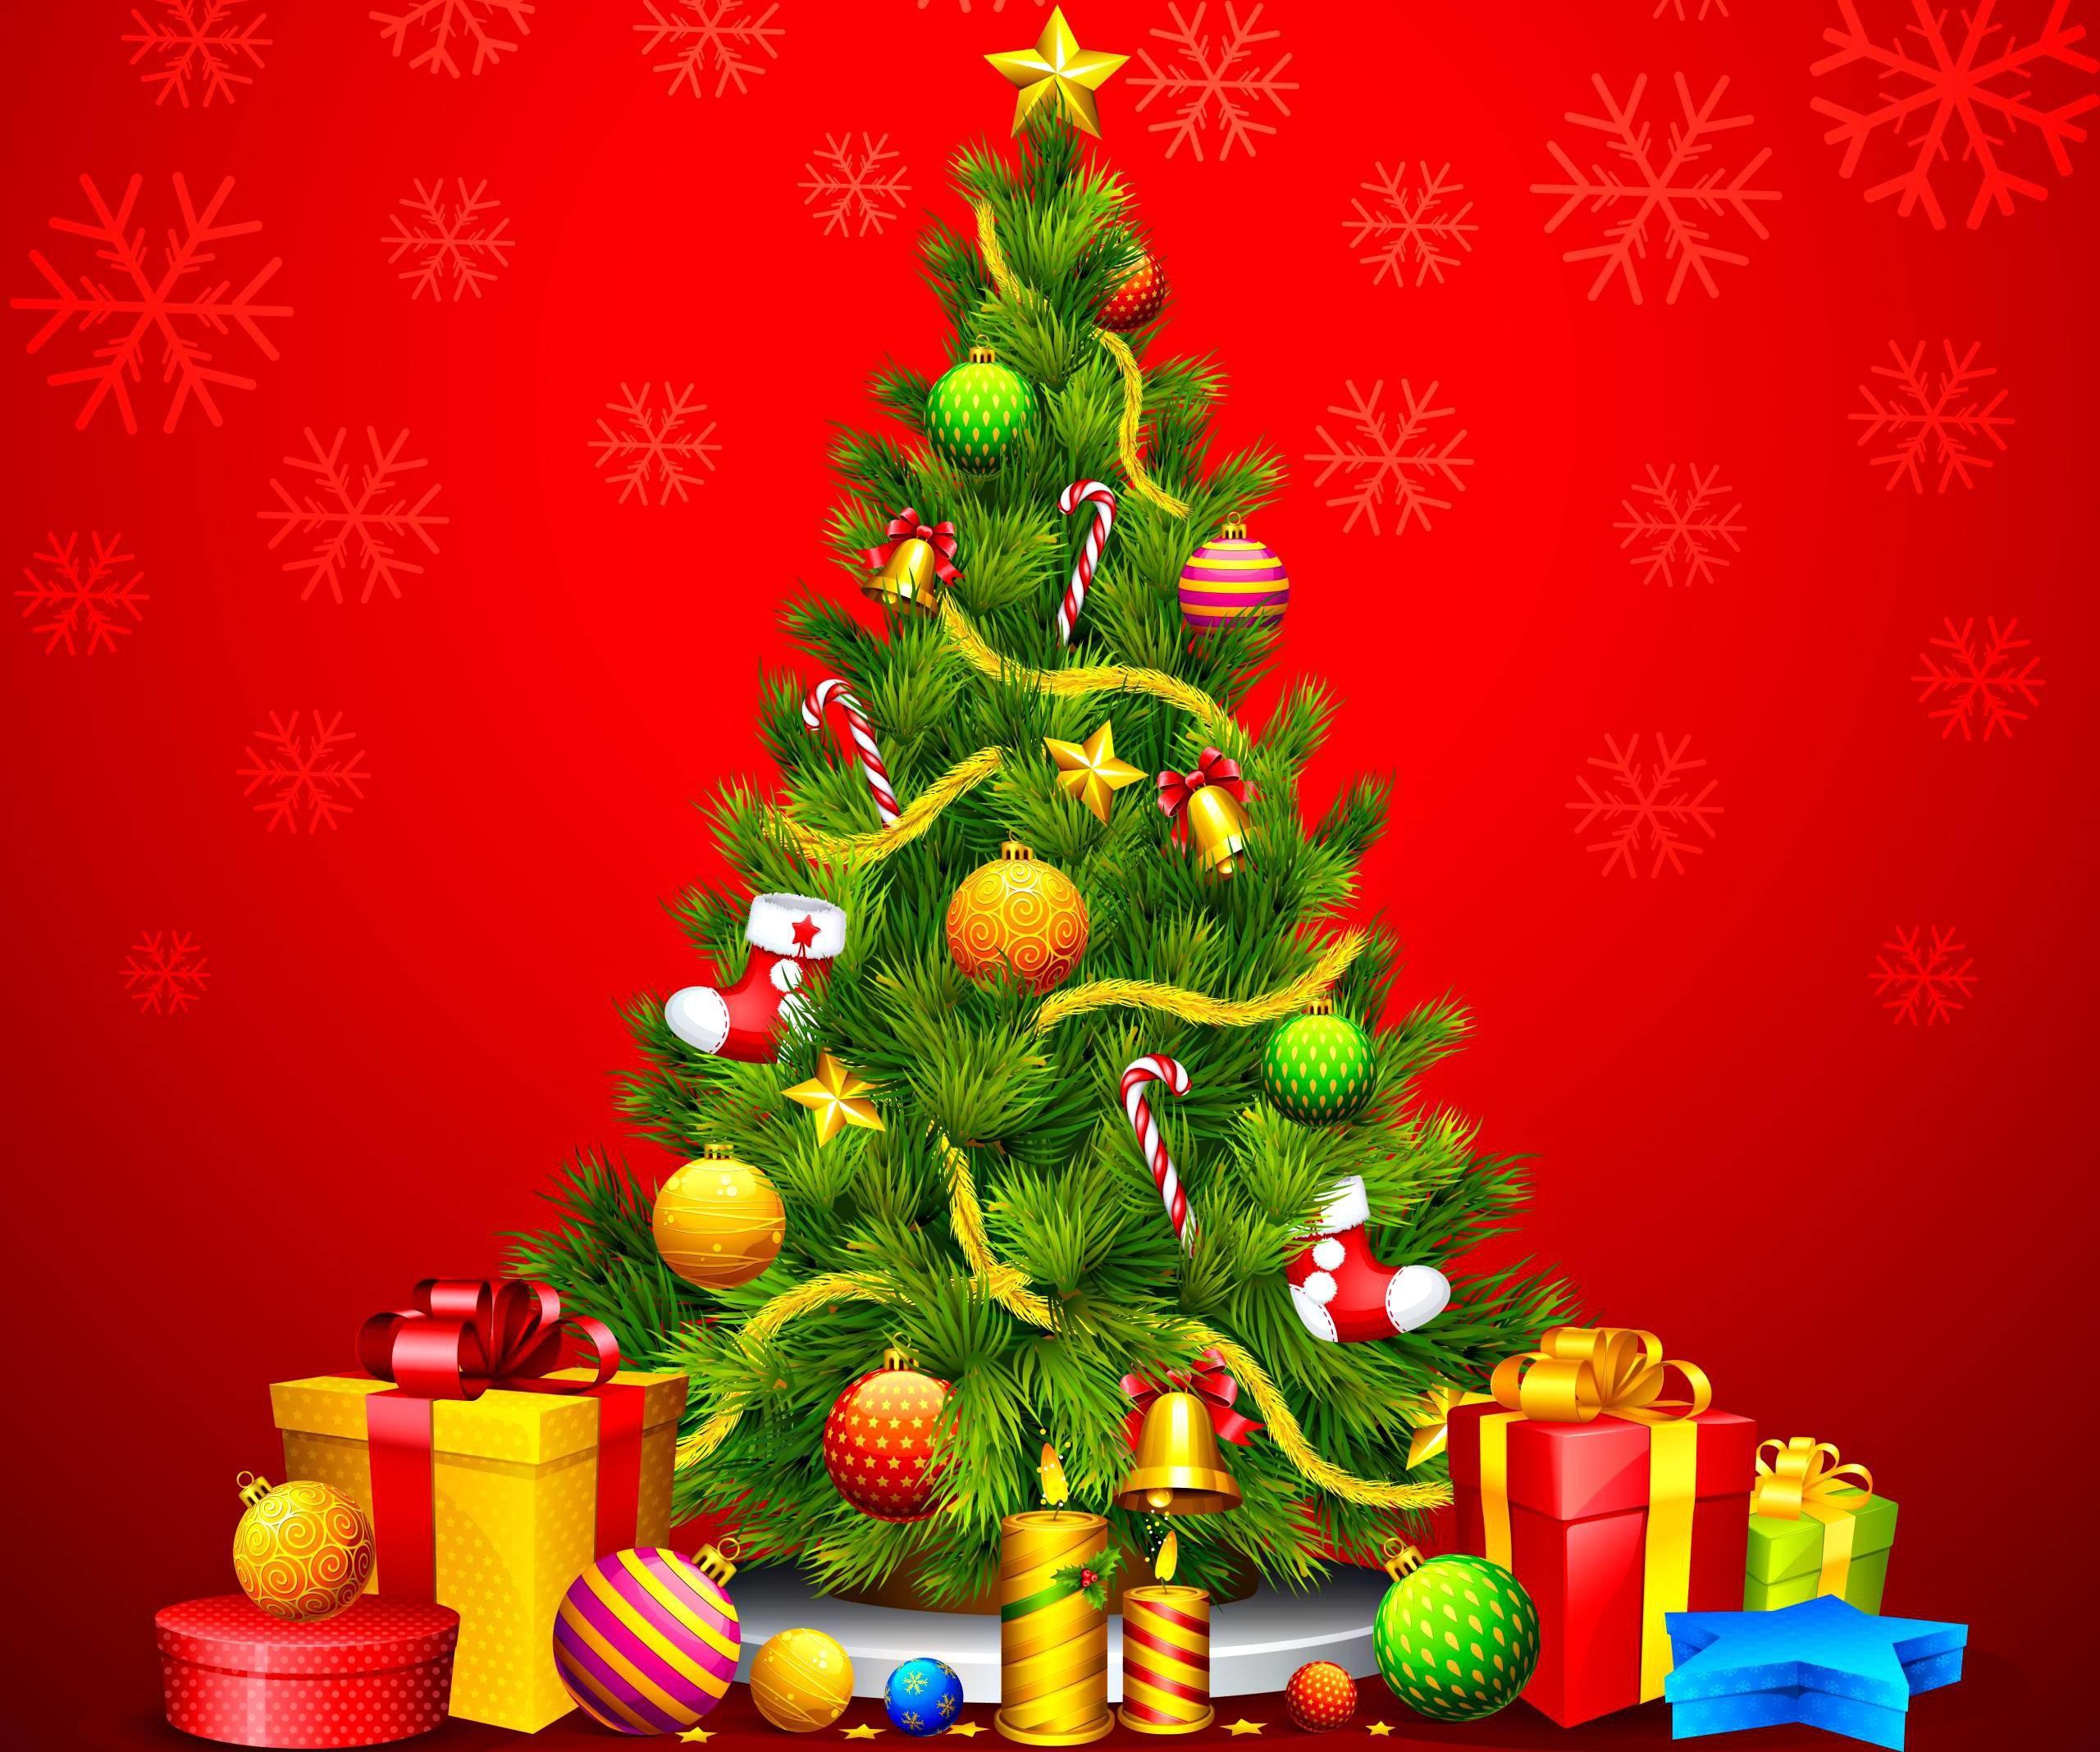 Christmas Tree Wallpaper Backgrounds Wallpapertag